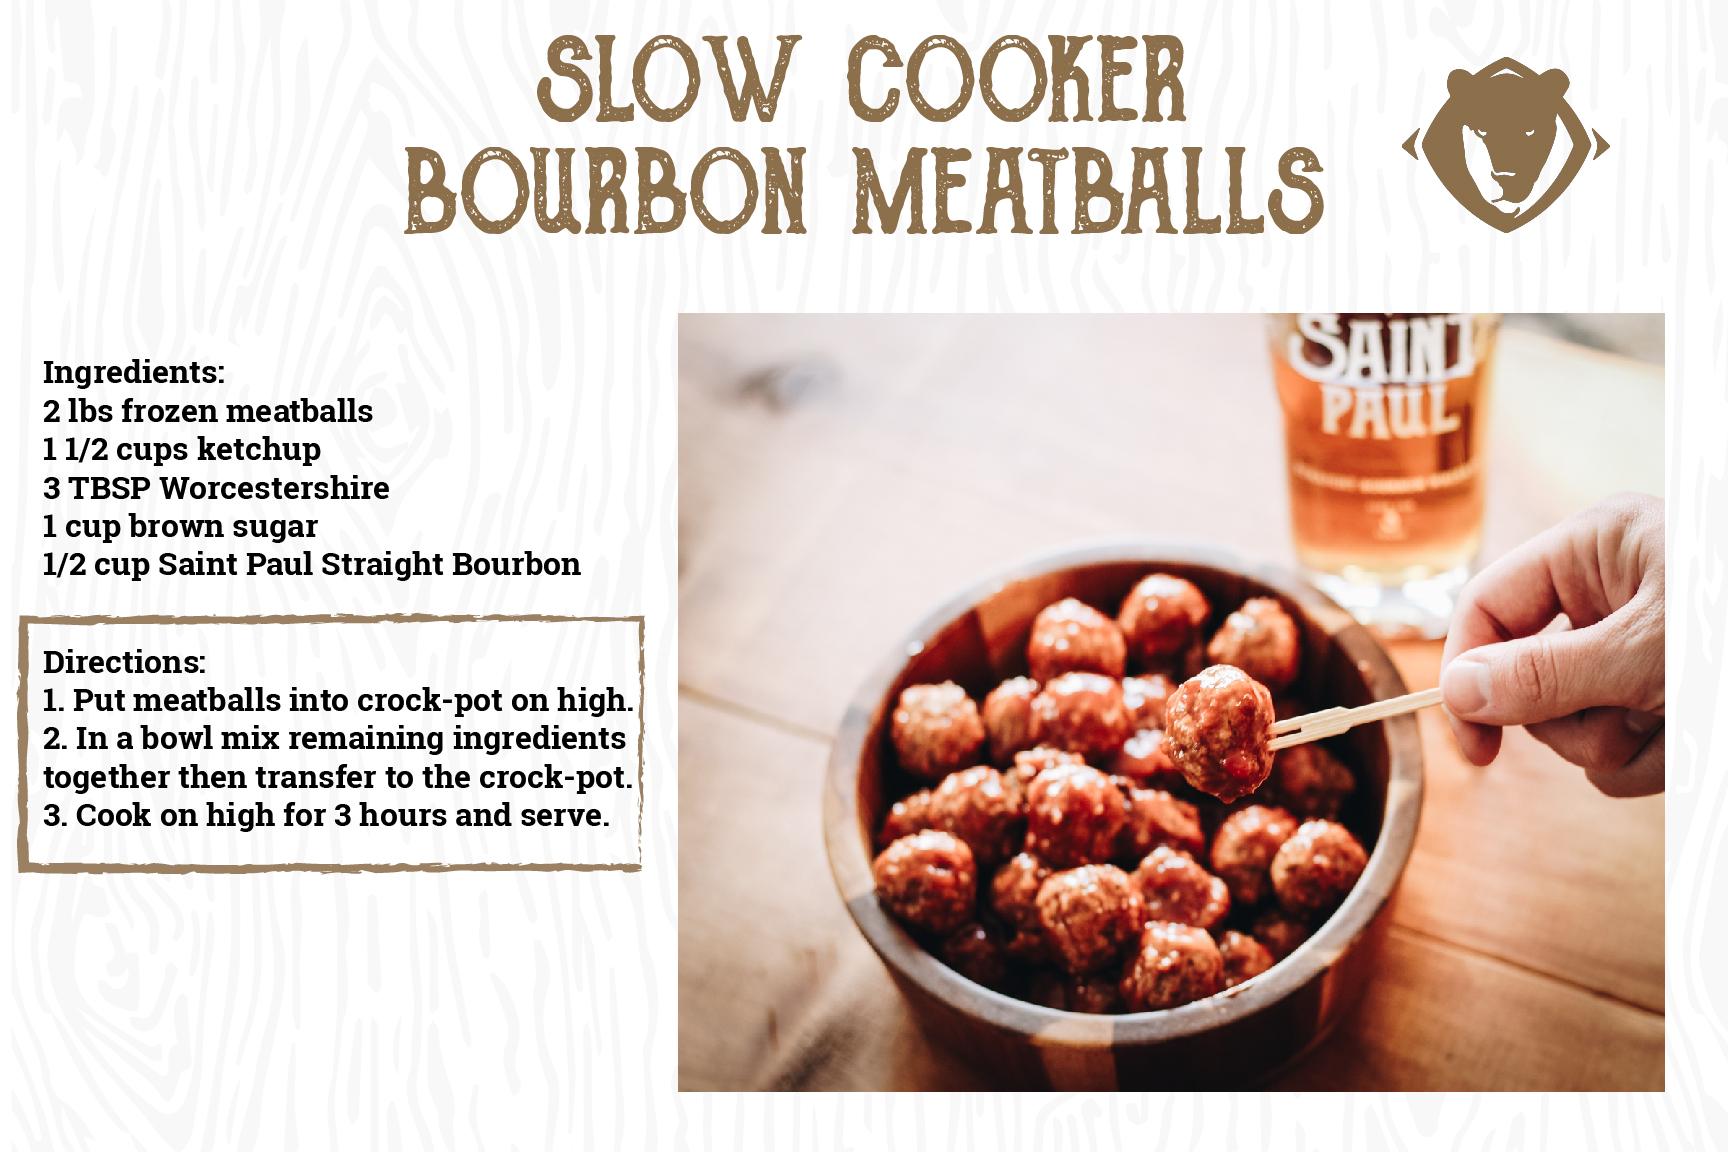 Slow Cooker Bourbon Meatballs